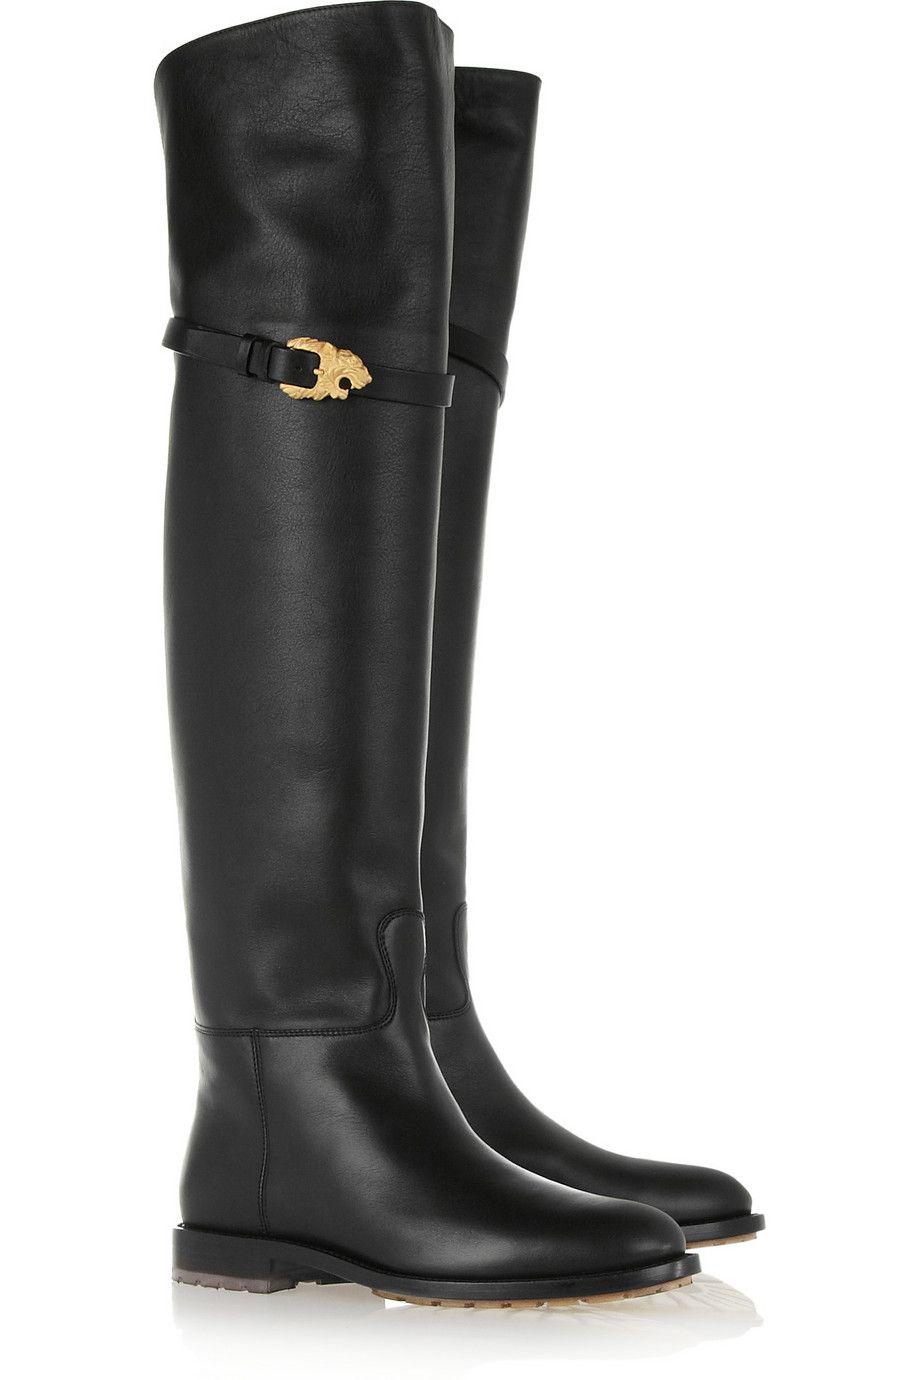 Shoe Addiction // Valentino | Animalia black leather over-the-knee boots |